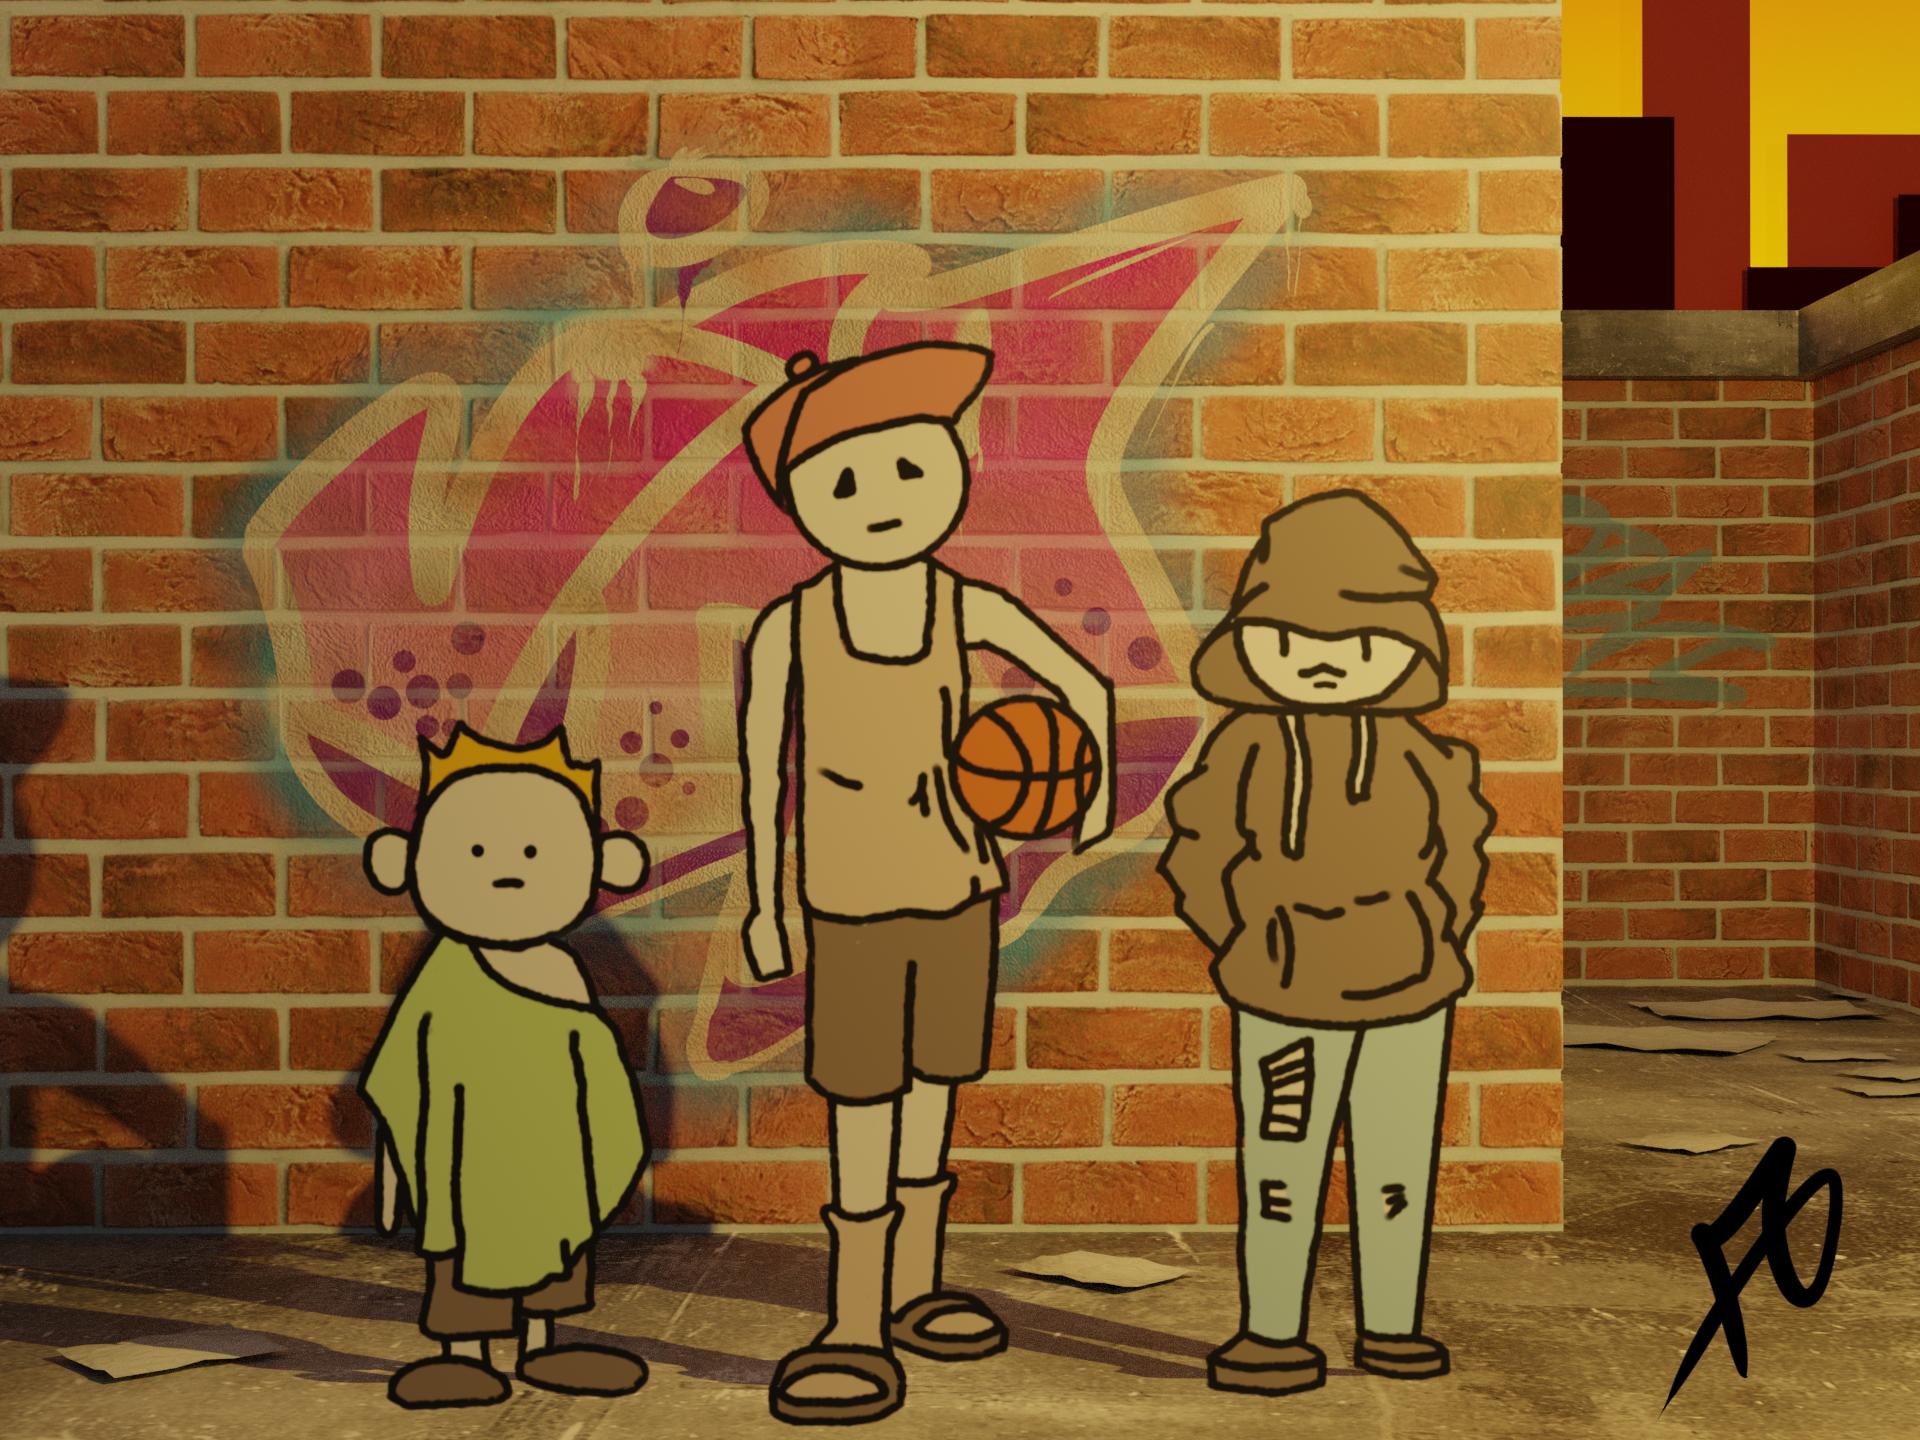 The Kids on Melancholy Street